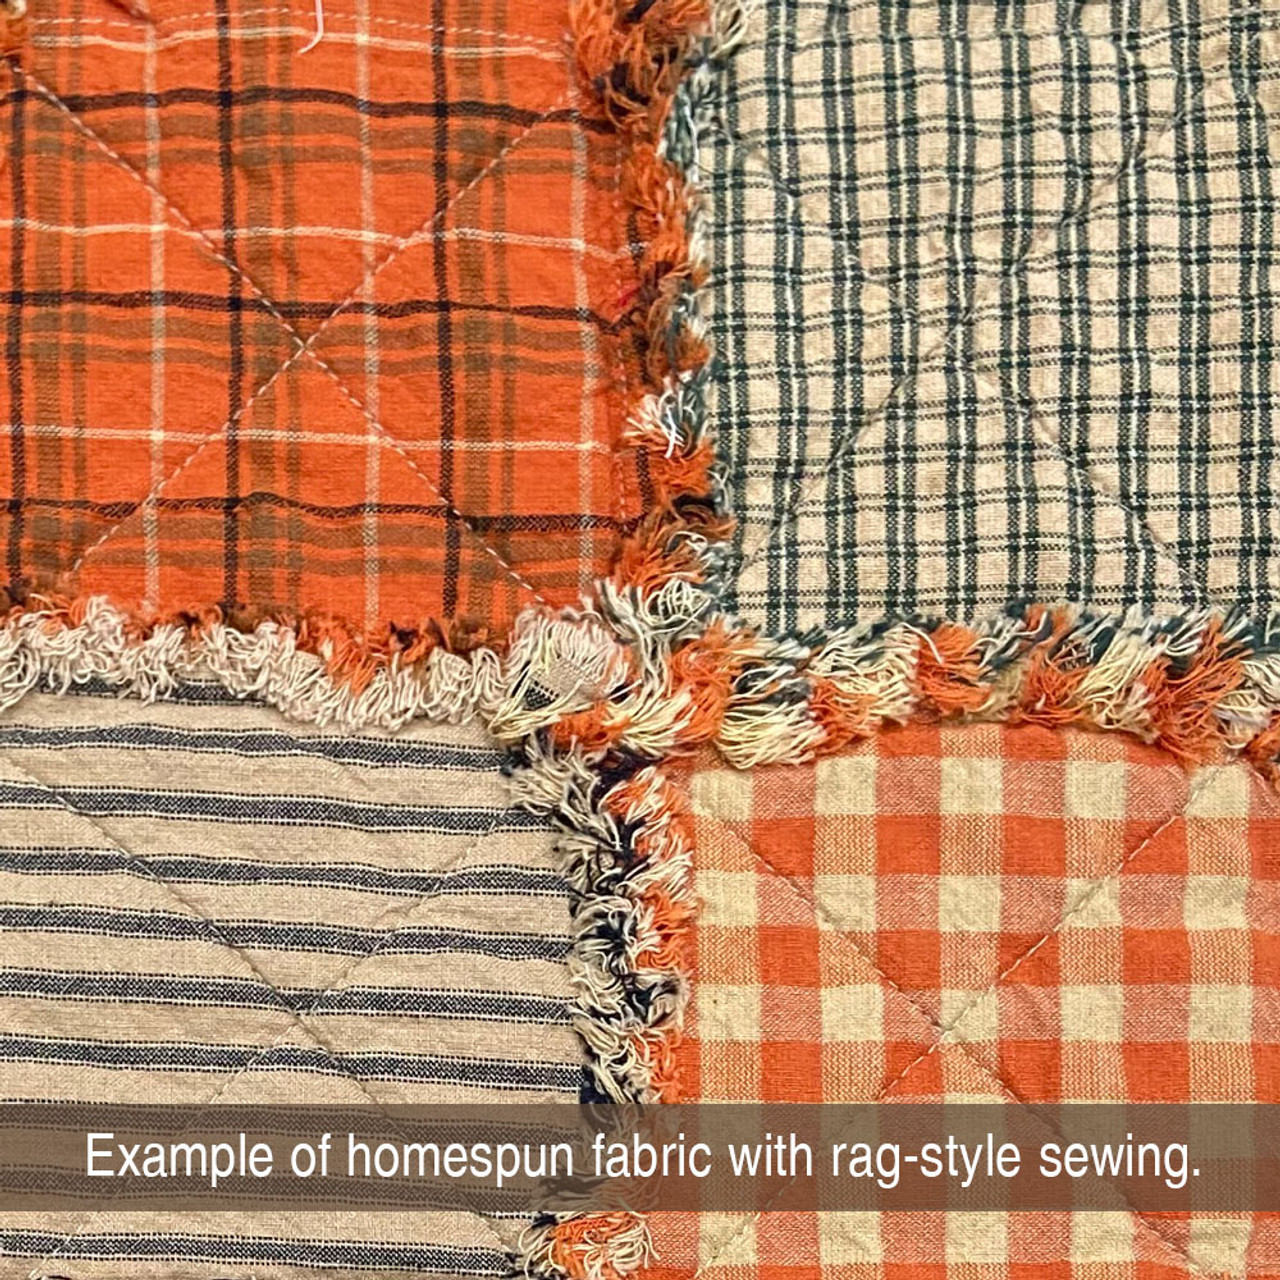 Autumn Spice Ragged Homespun Quilt Kit